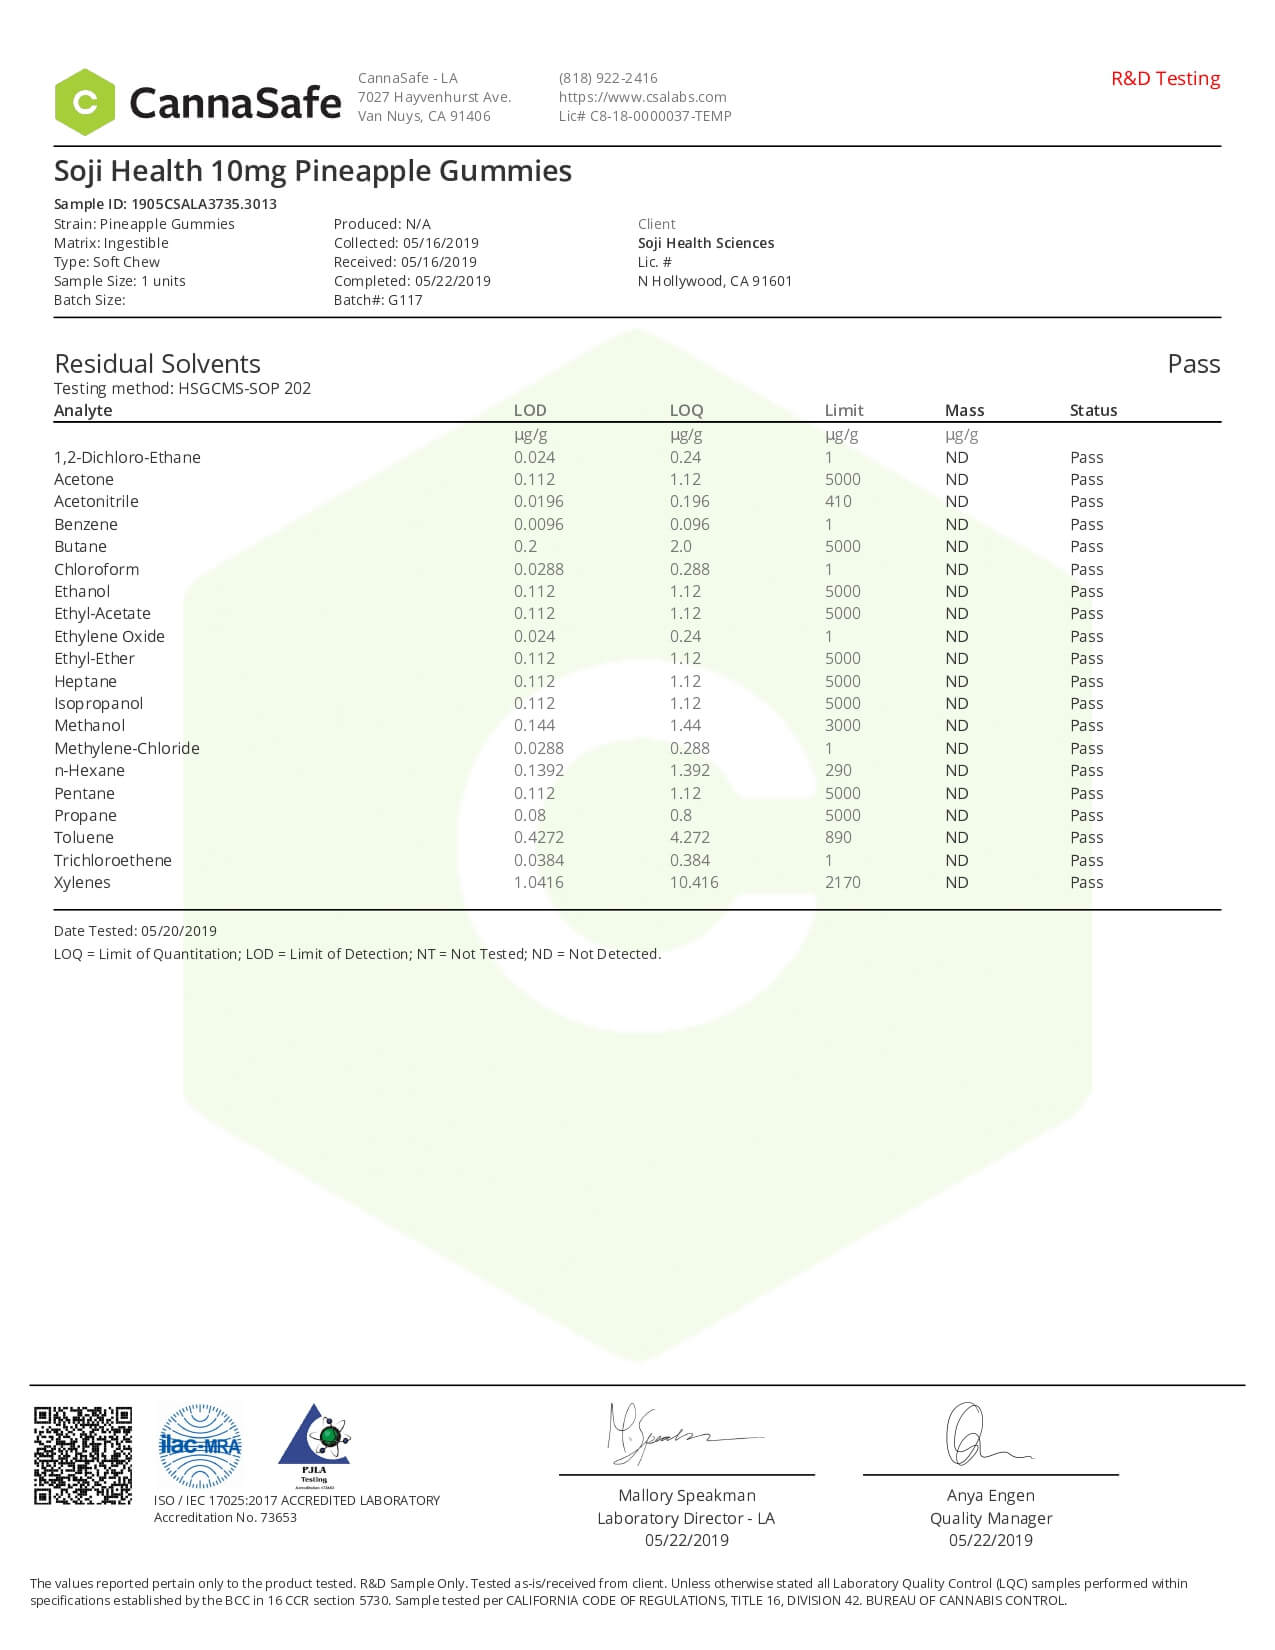 Soji Health CBD Edible Pineapple Gummies Lab Report